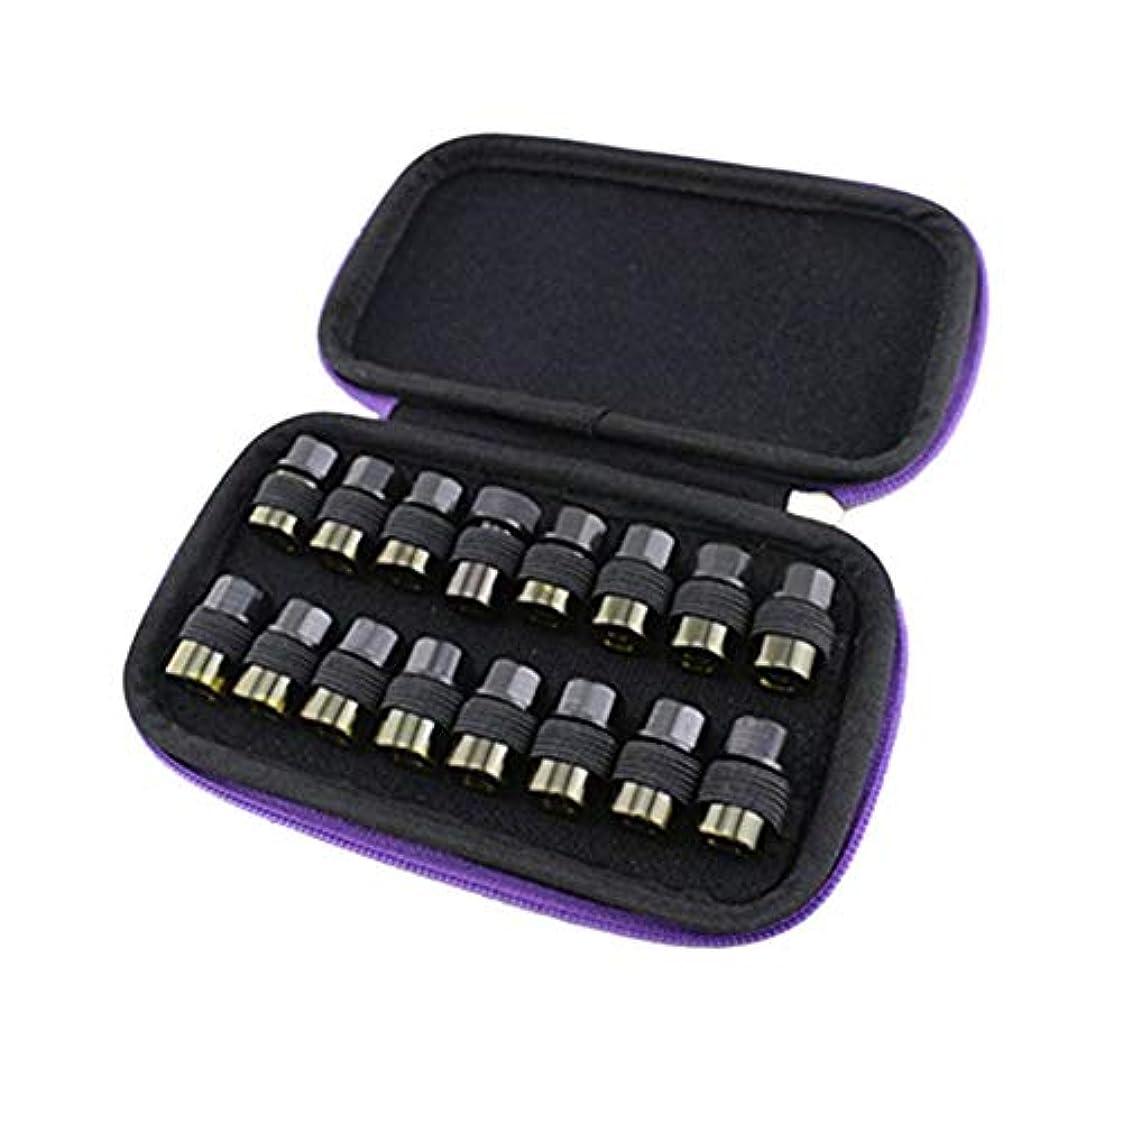 Pursue エッセンシャルオイル収納ケース アロマオイル収納ボックス アロマポーチ収納ケース 耐震 携帯便利 香水収納ポーチ 化粧ポーチ 16本用